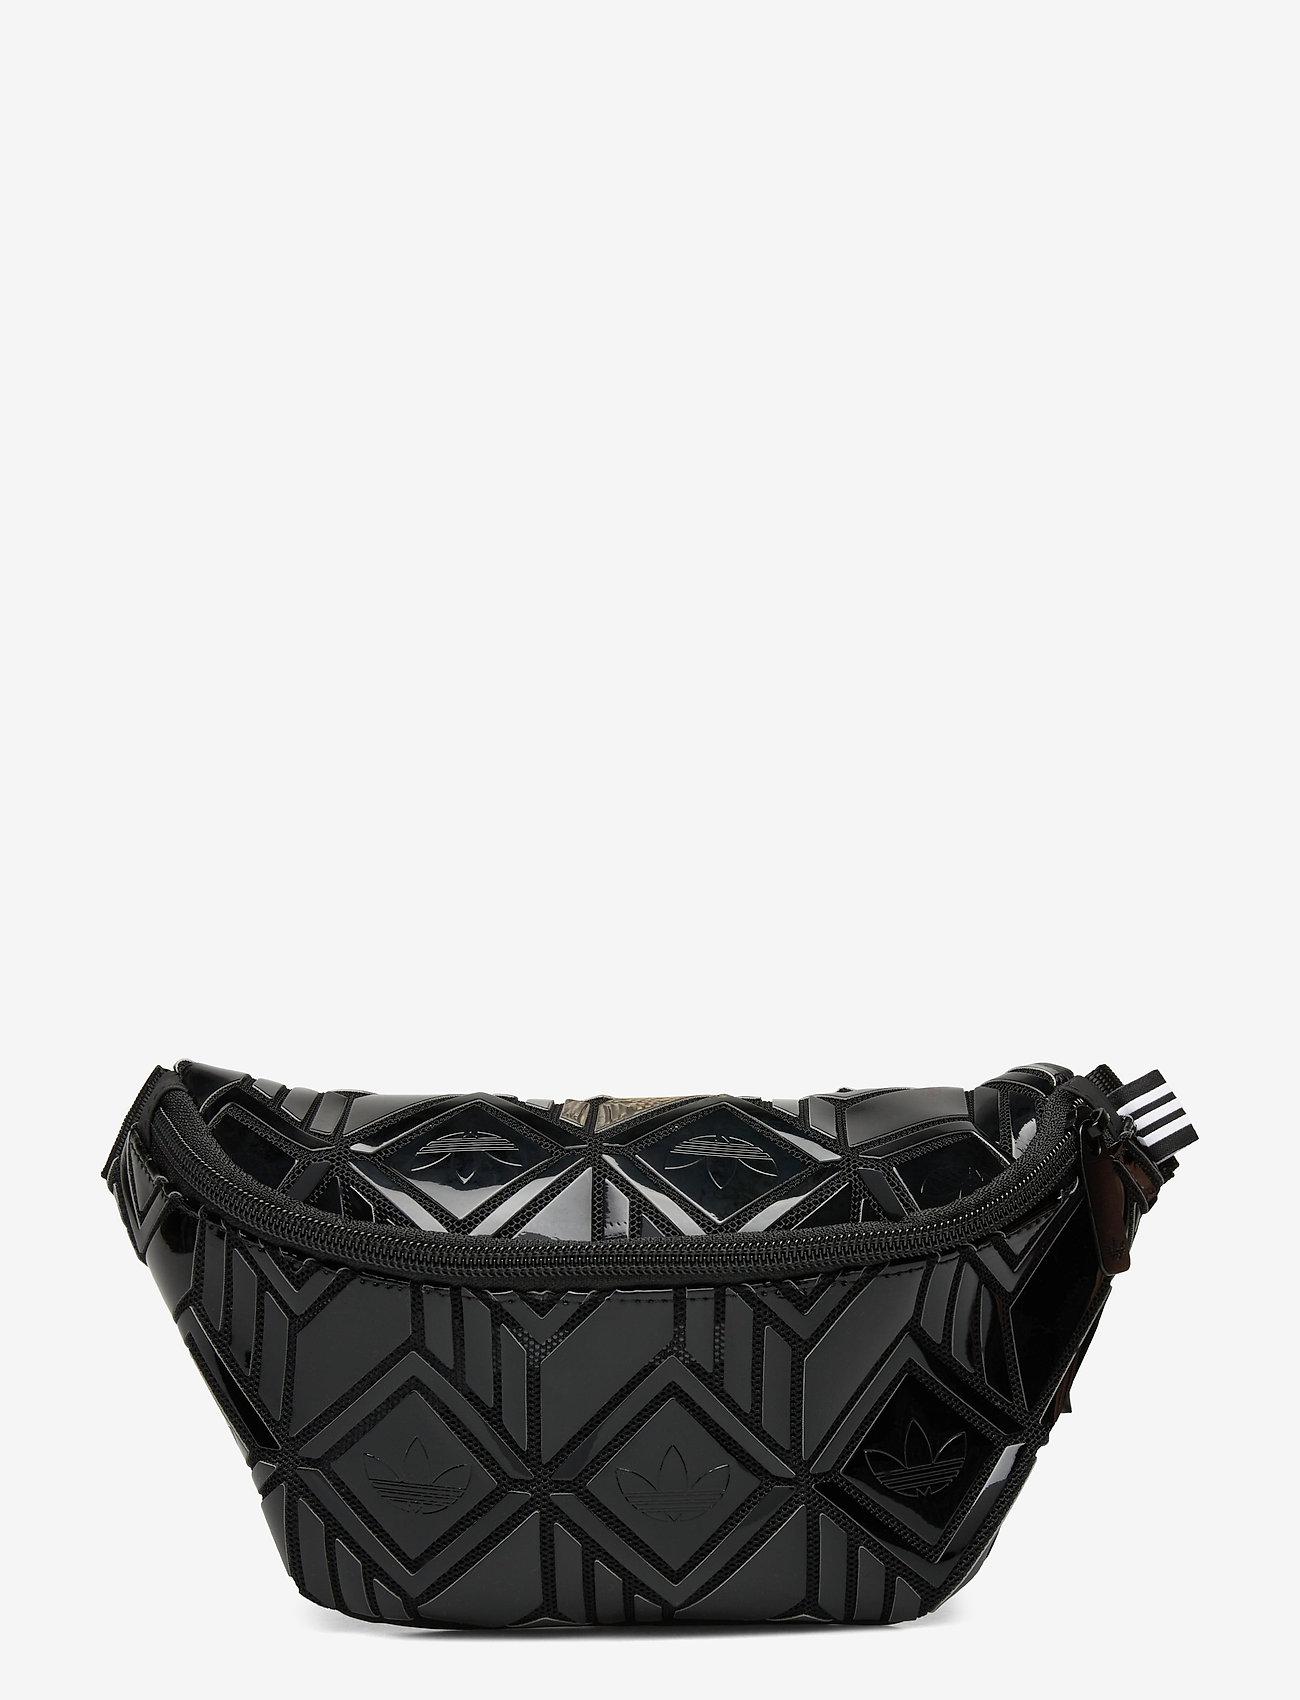 adidas Originals - WAISTBAG 3D - tassen - black - 0